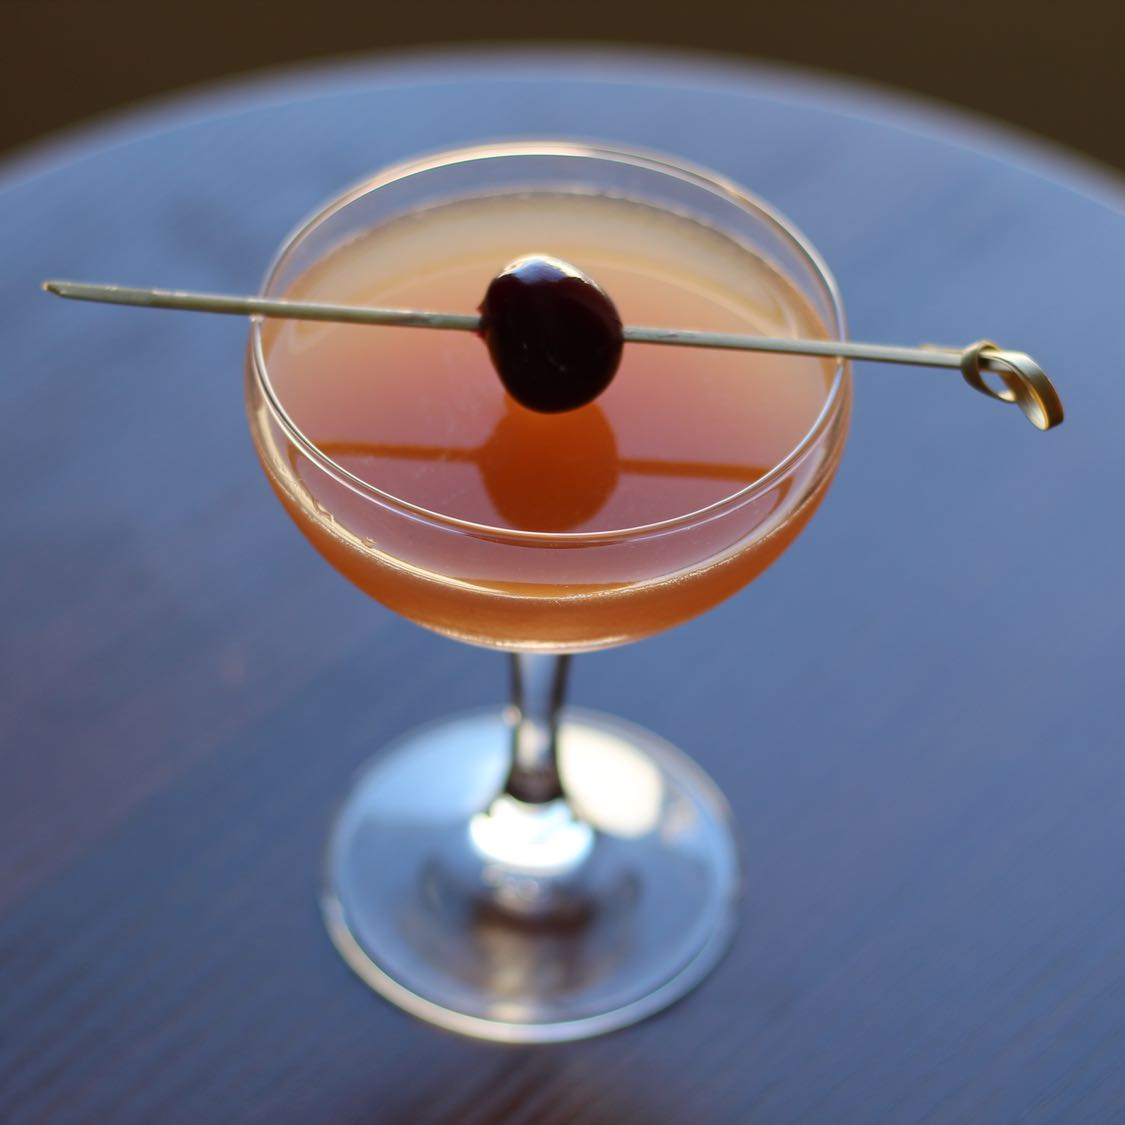 Blinker Cocktail - Original 1948 David Embury Recipe